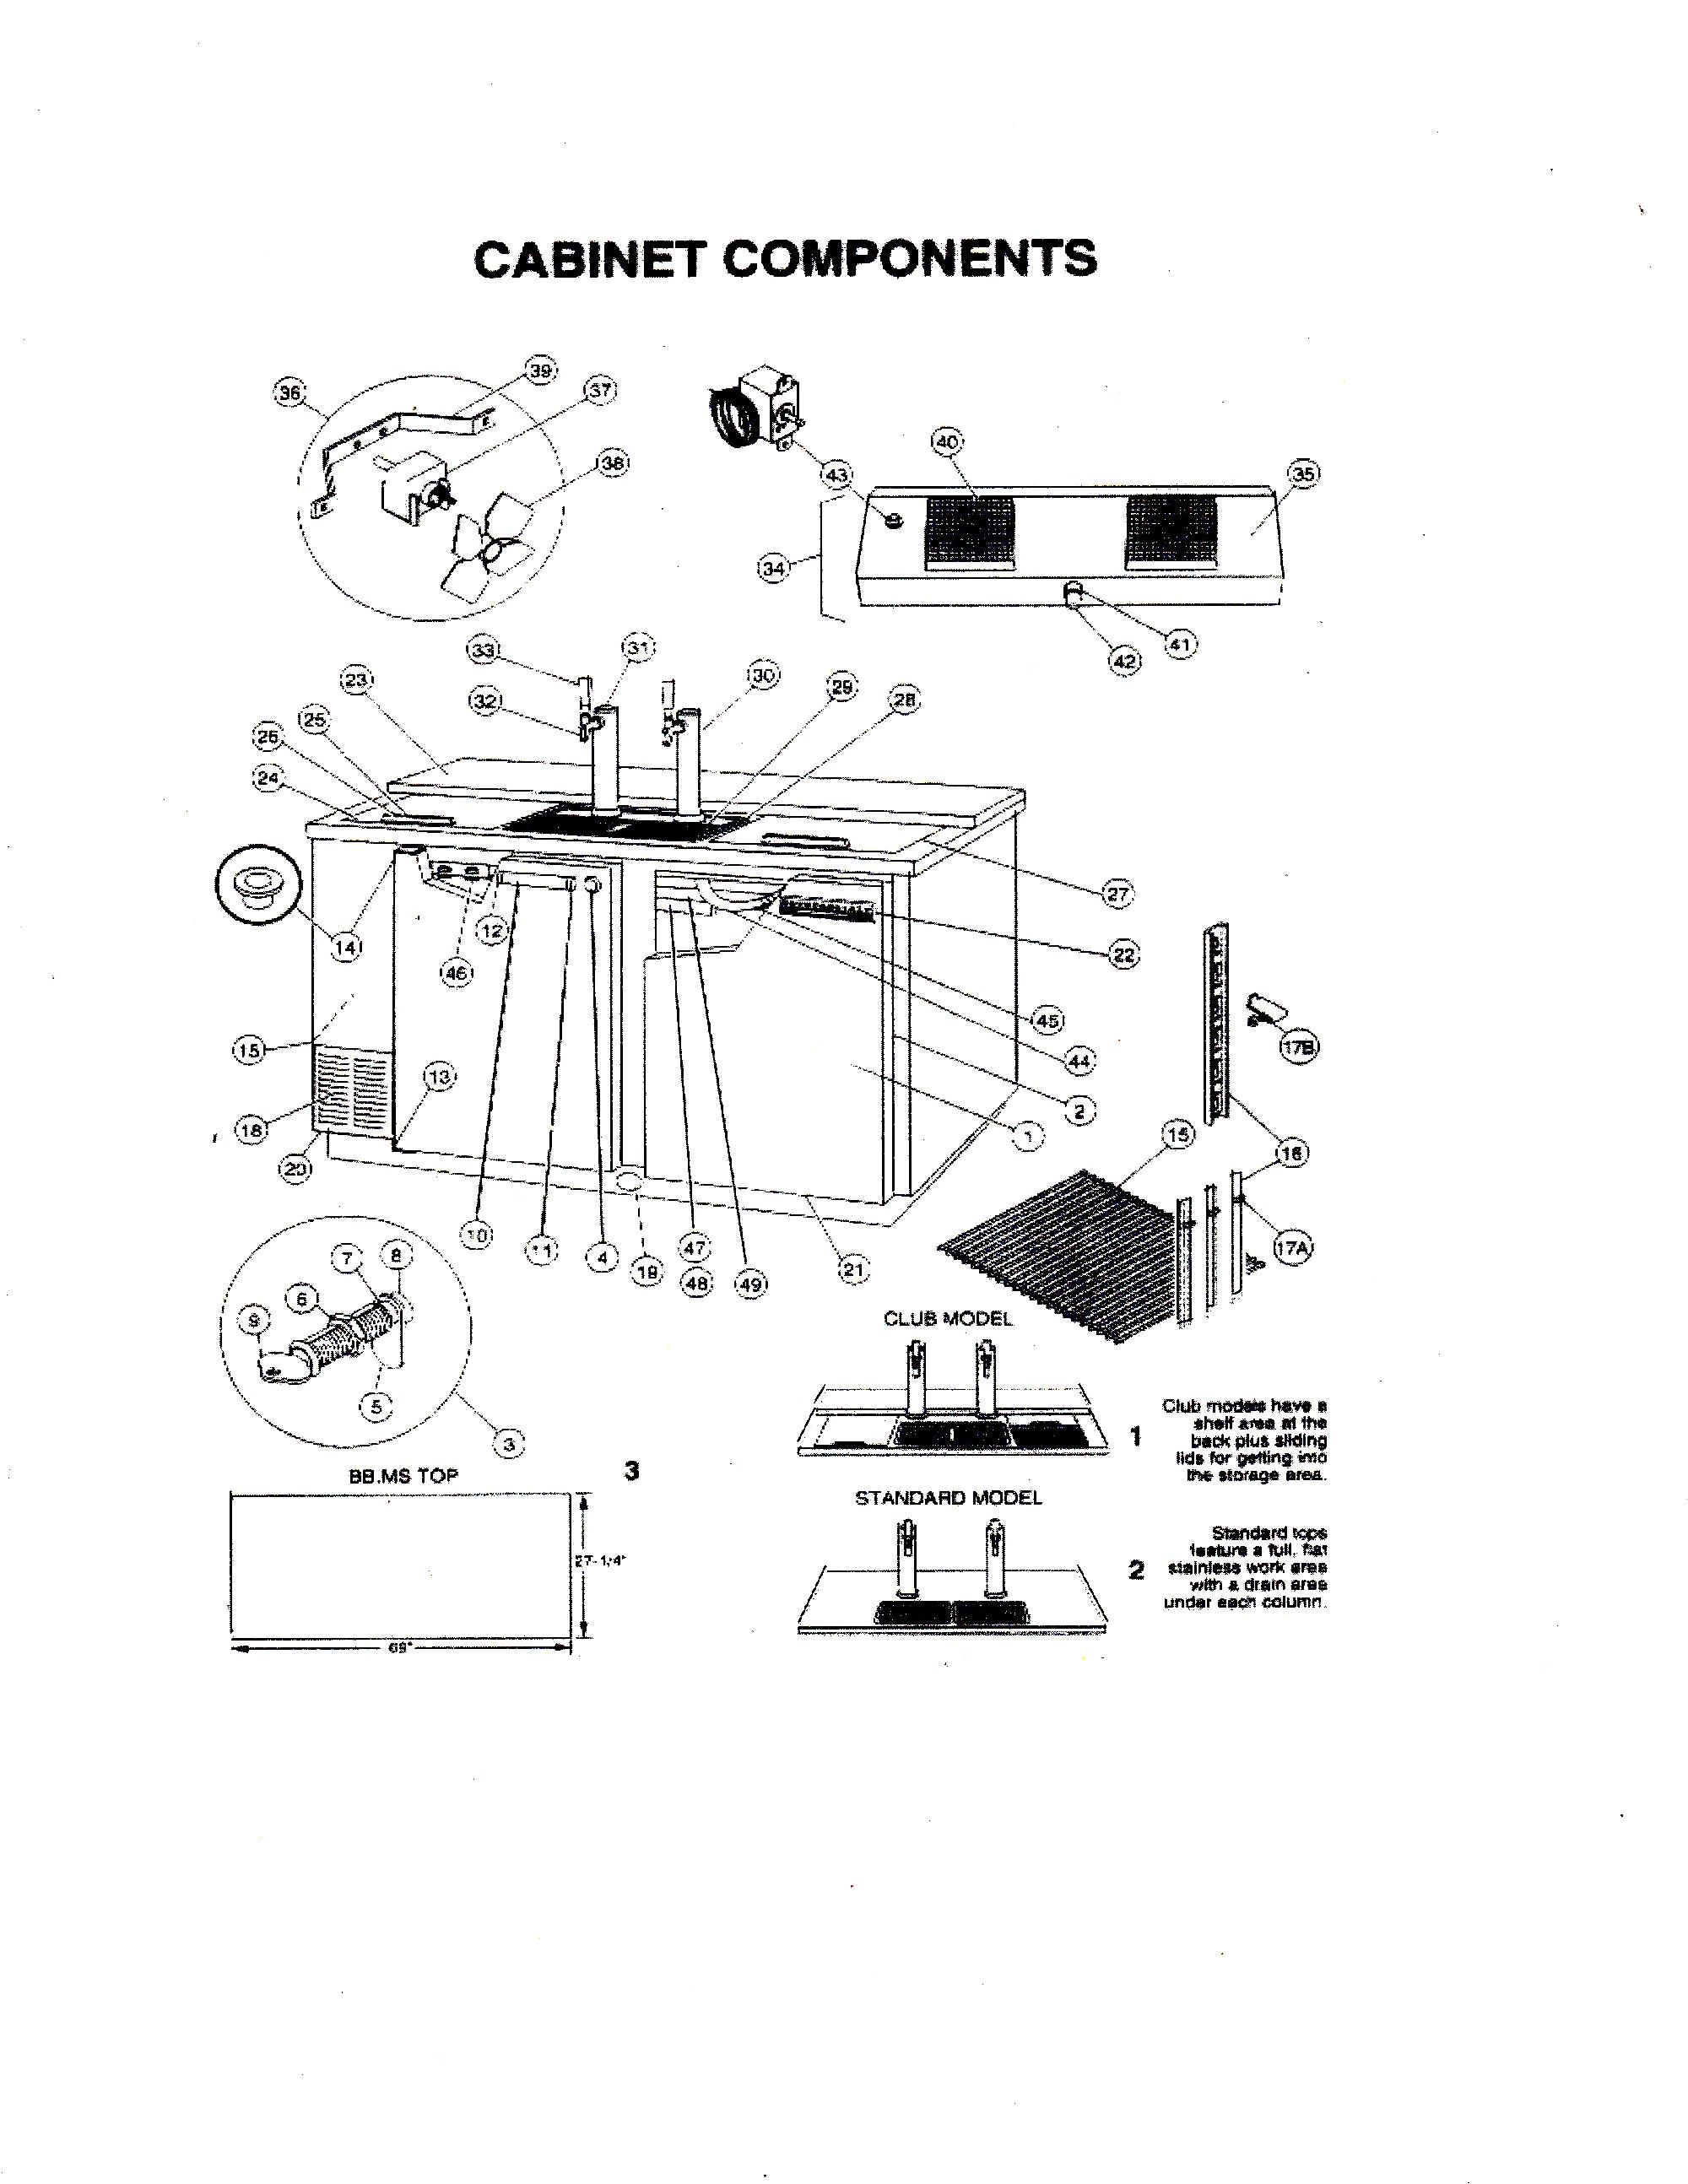 Wiring Database 2020: 28 Beverage Air Bm23 Parts Diagram